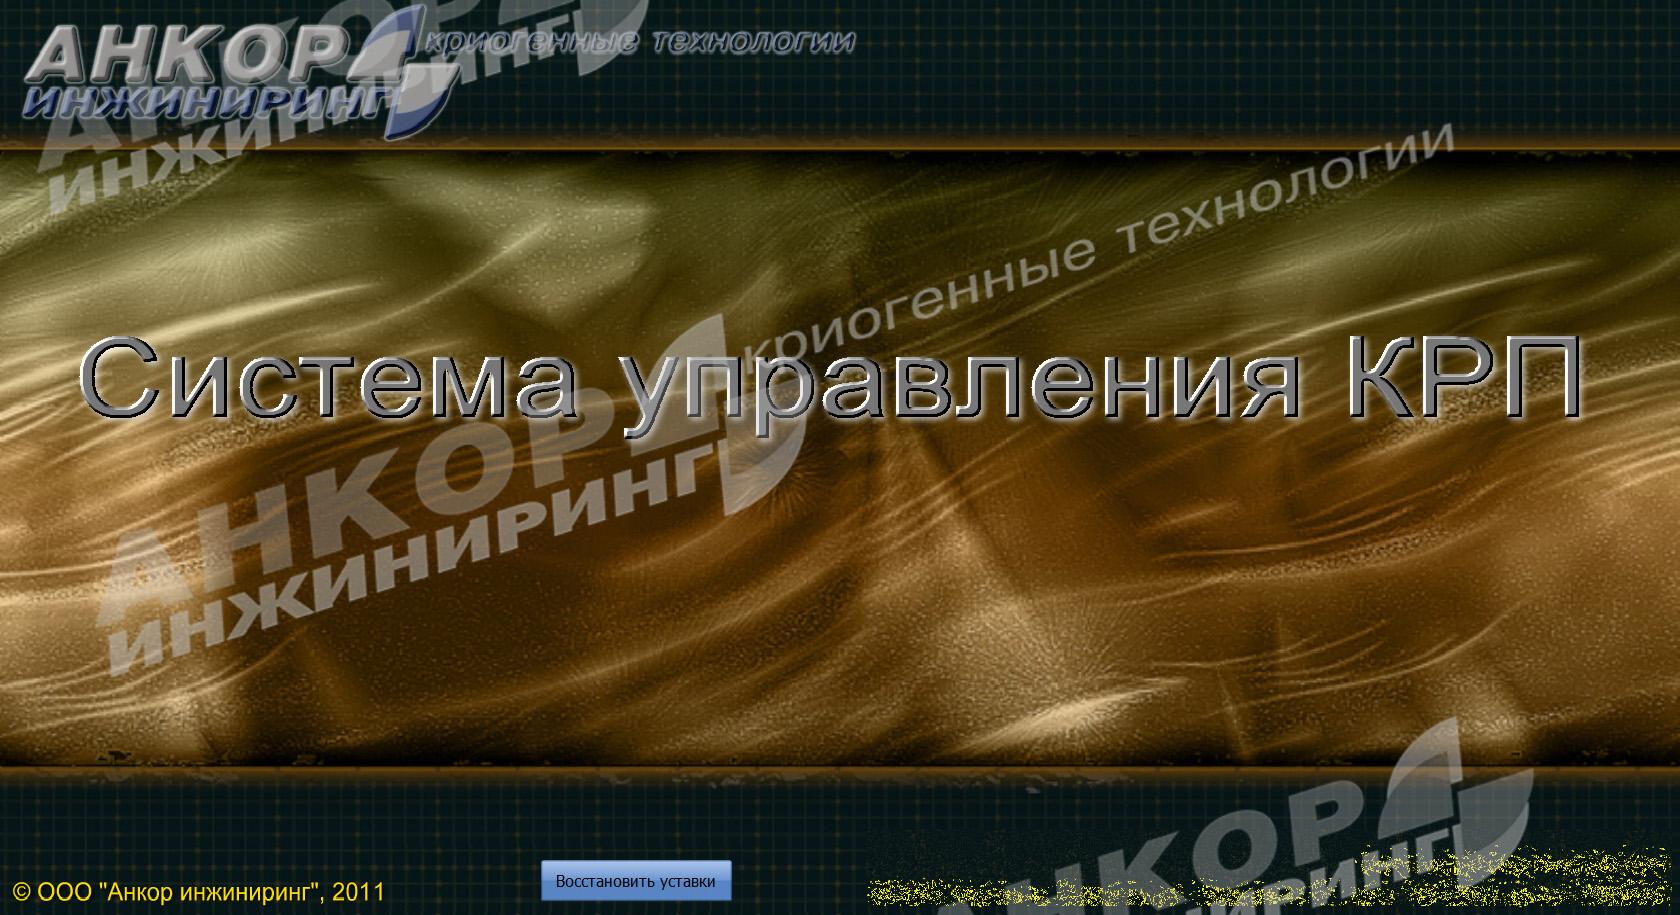 Ankor_EMSS_KRP_10